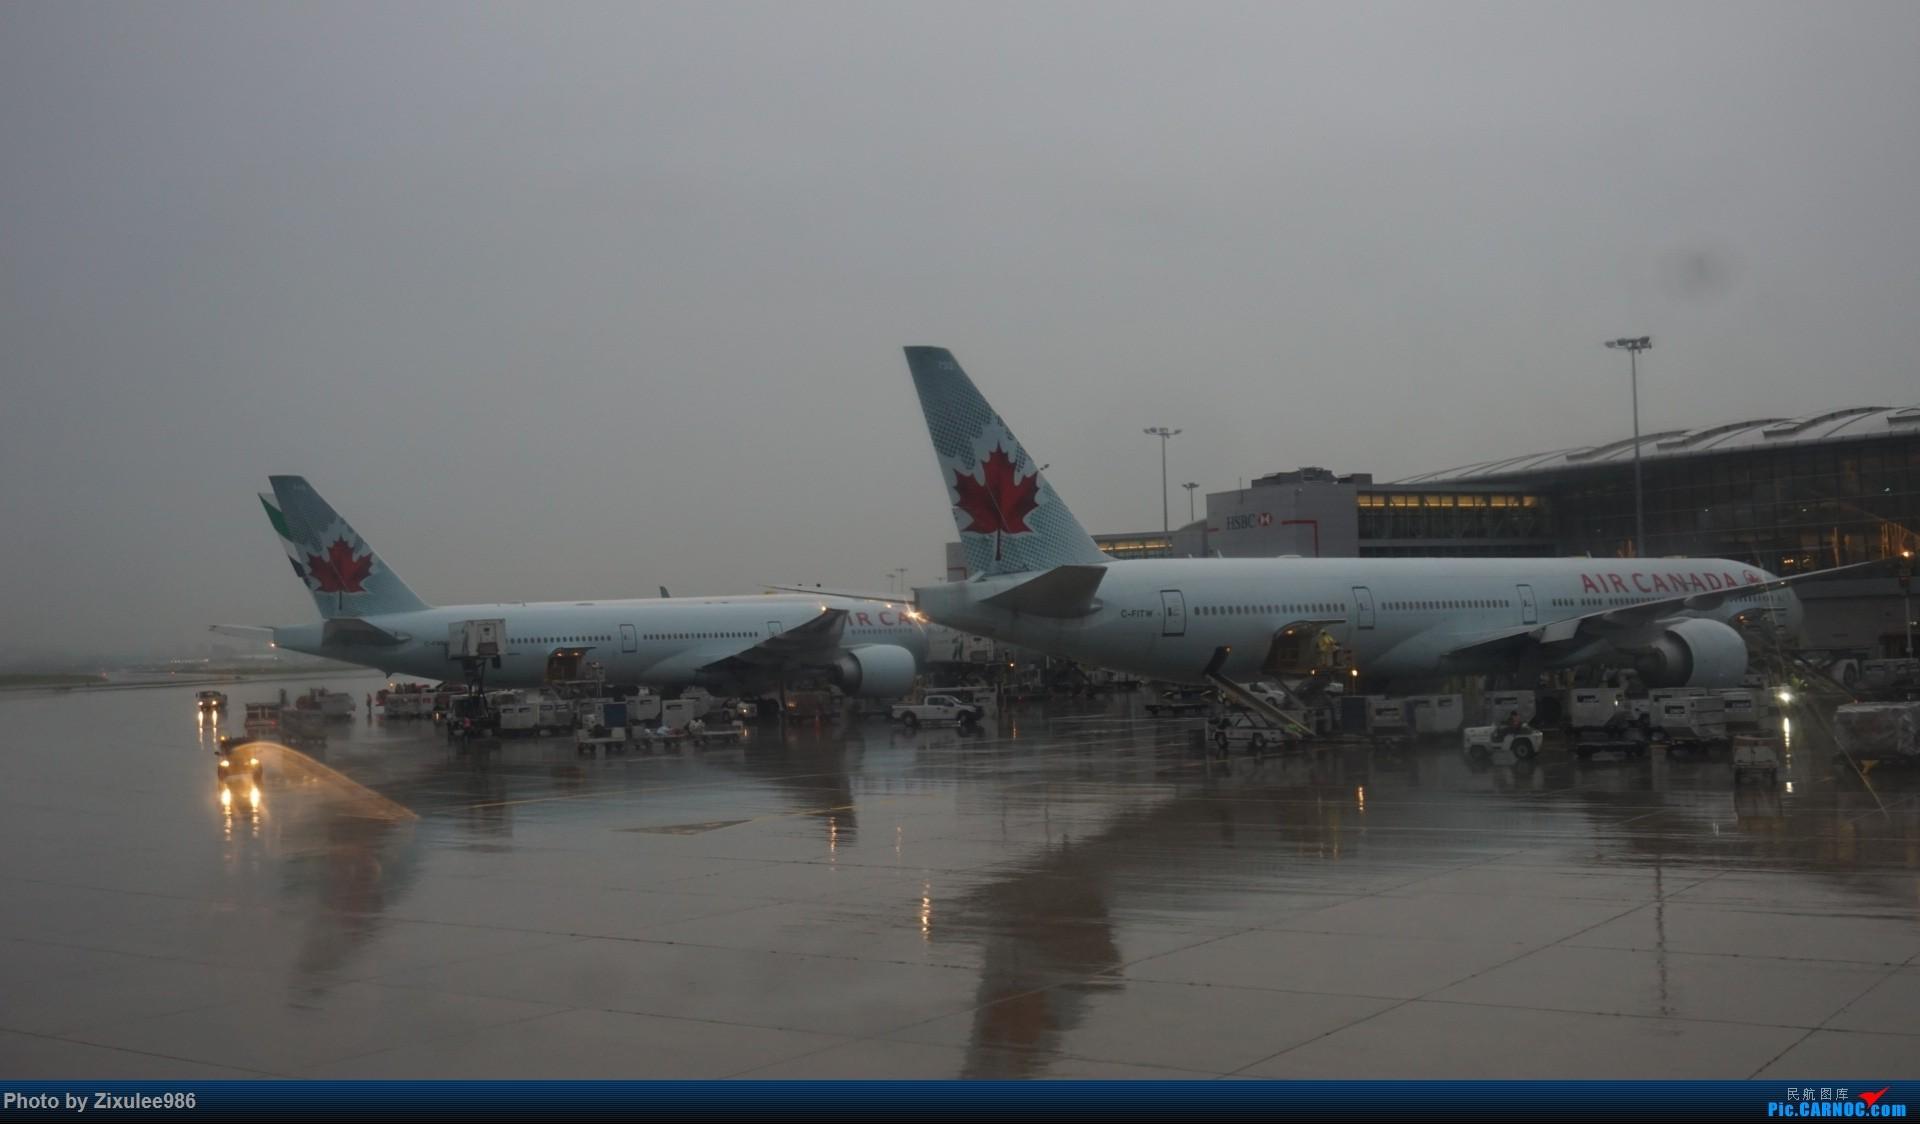 Re:[原创]加拿大21日游学之旅 (二)~加航AC28..PVG-YYZ到达多村后的雨天~多图缓更(将会附上上一集忘发的flightlog)请各位大侠谅解~ BOEING 777-333 (ER)  加拿大多伦多皮尔逊机场